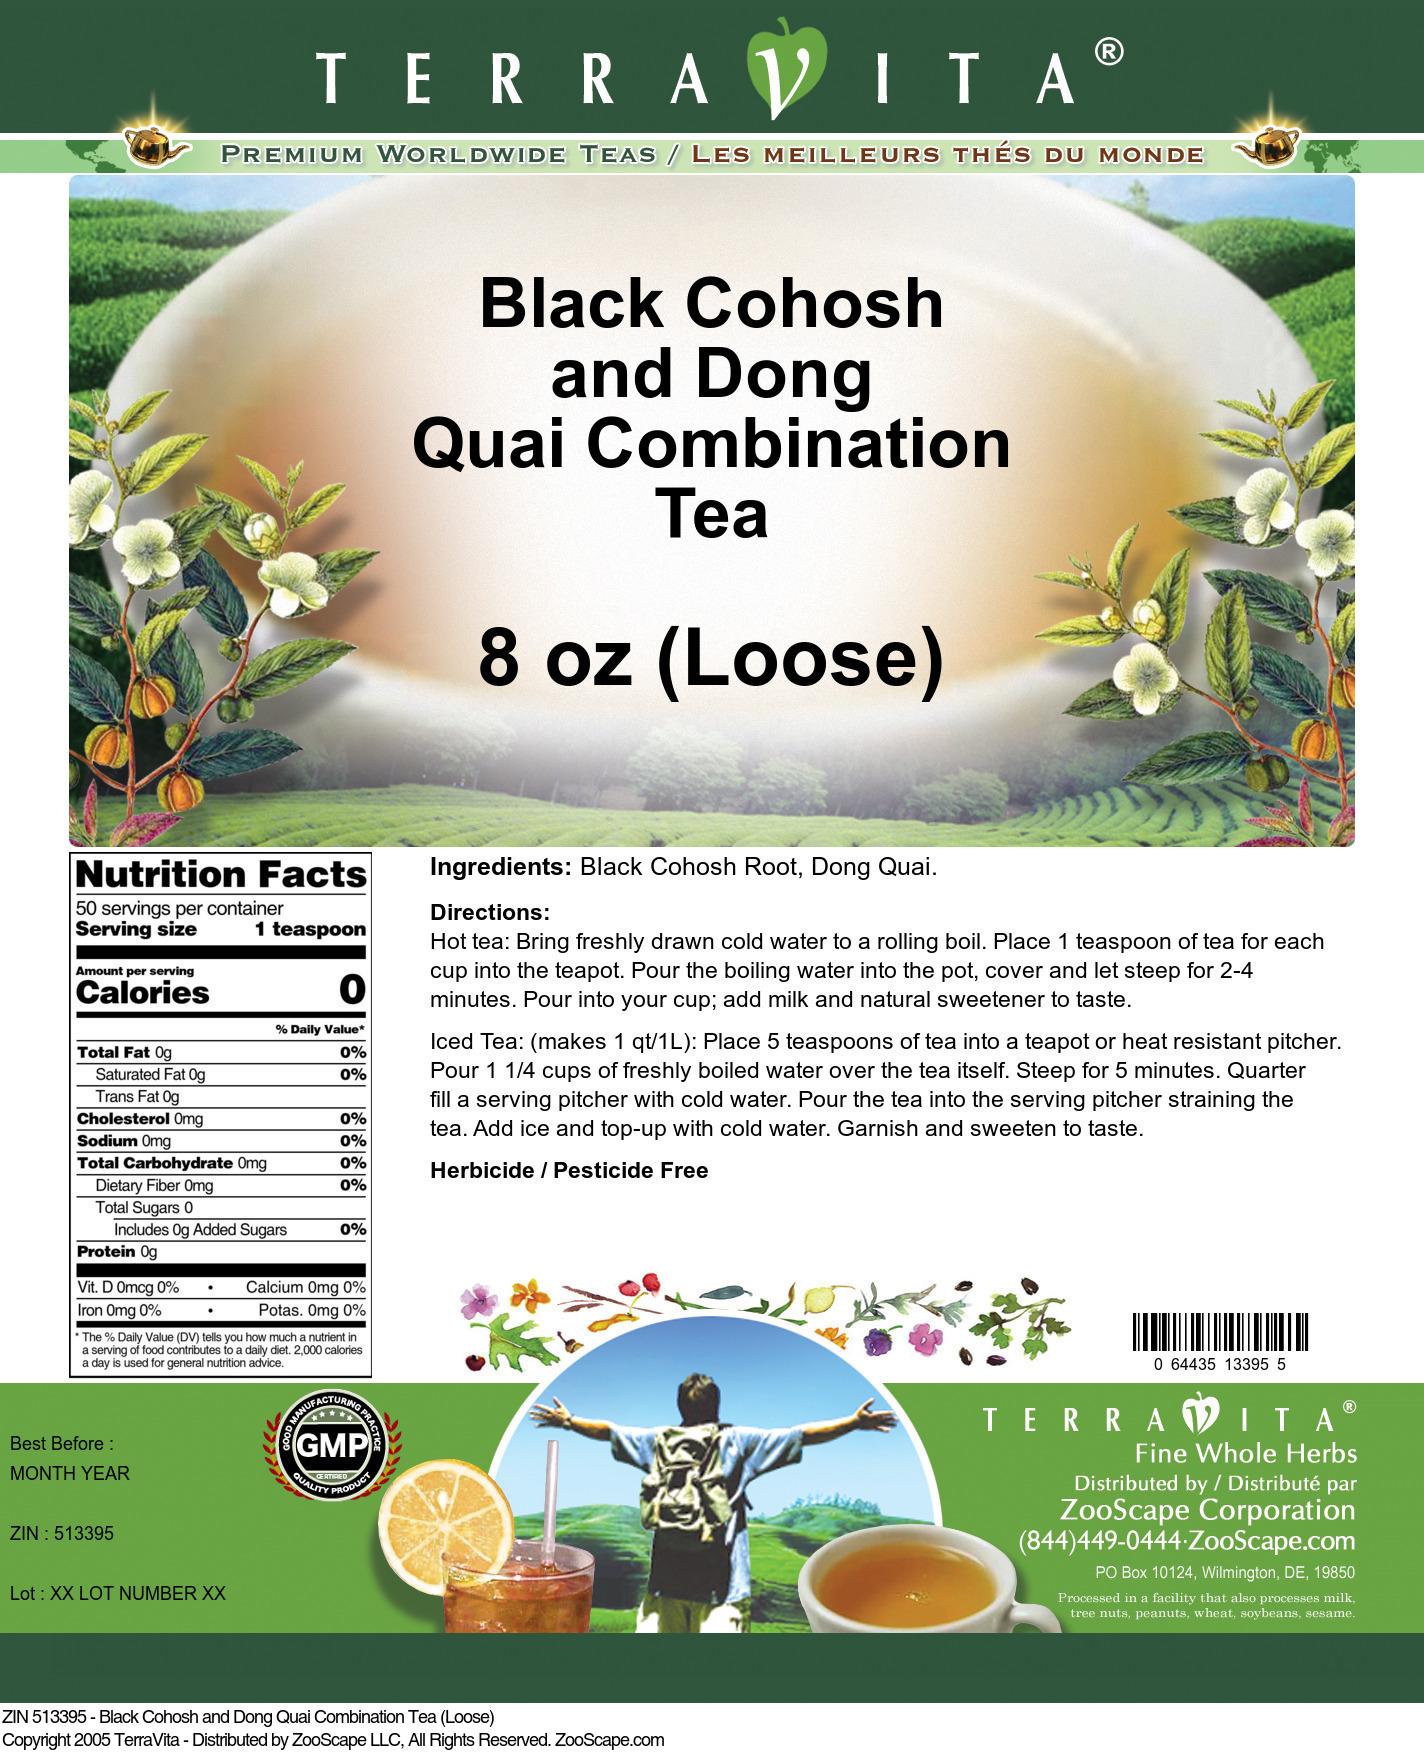 Black Cohosh and Dong Quai Combination Tea (Loose)